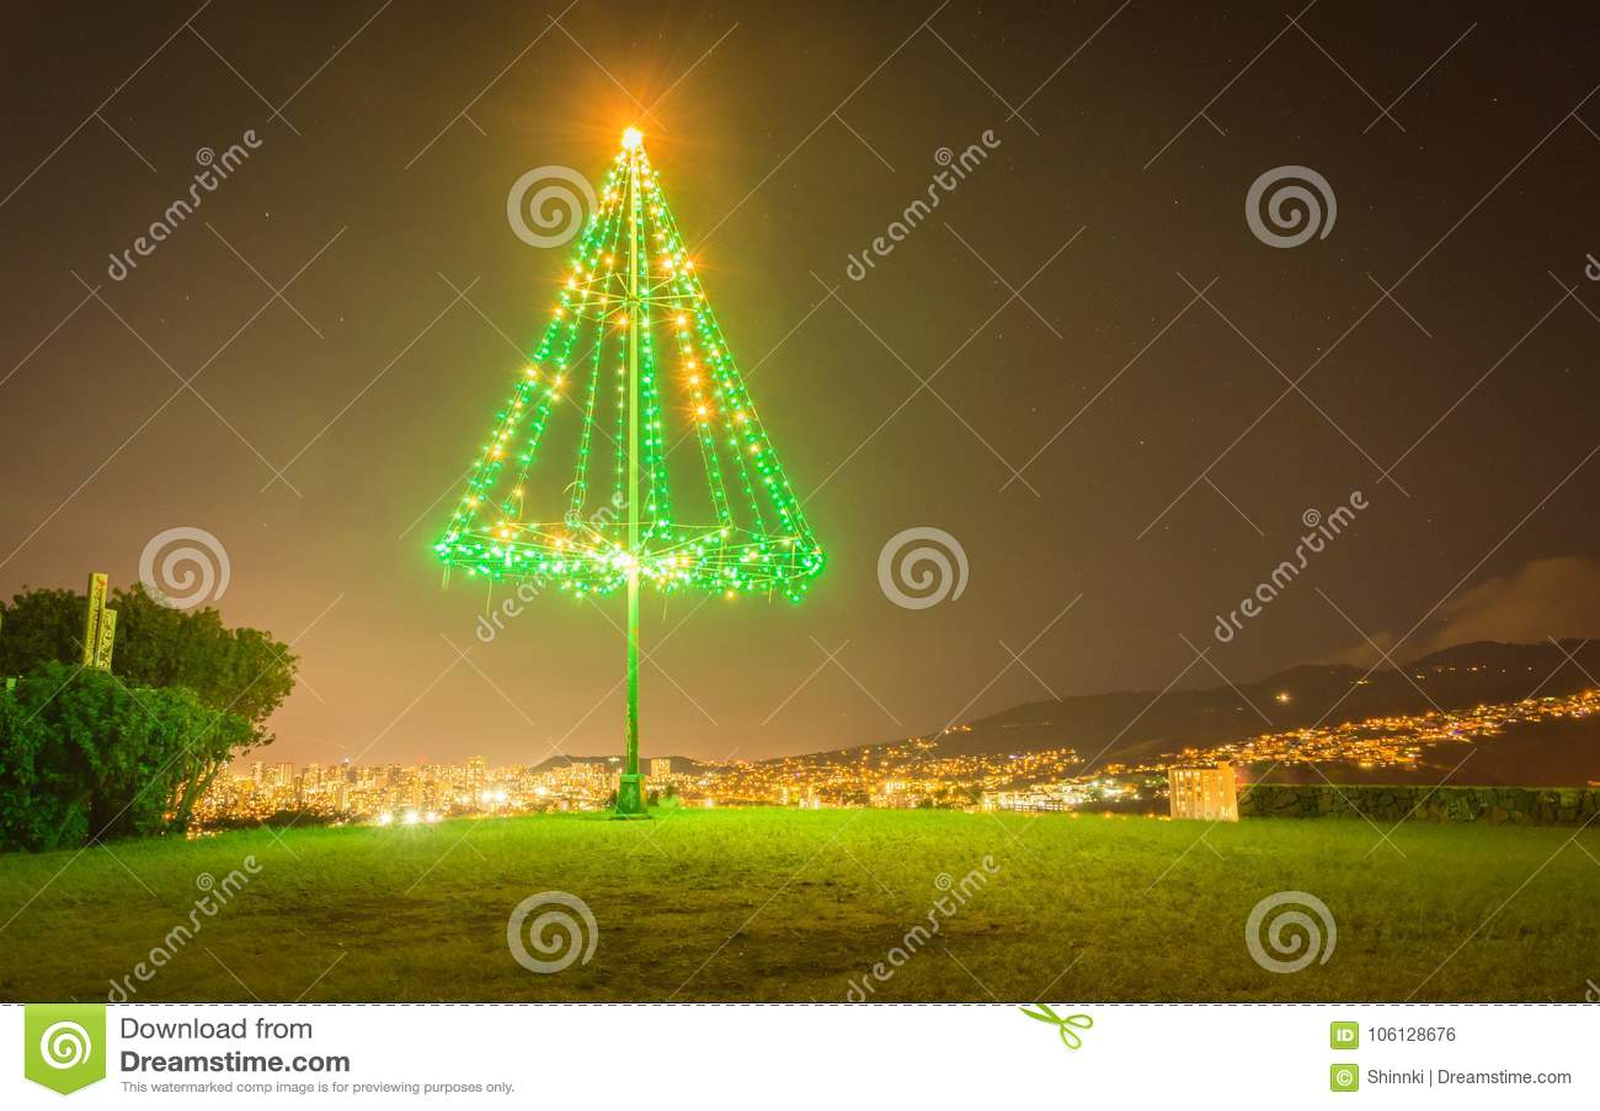 download large outdoor metal illuminated christmas tree stock photo image of orange december - Outdoor Metal Christmas Trees